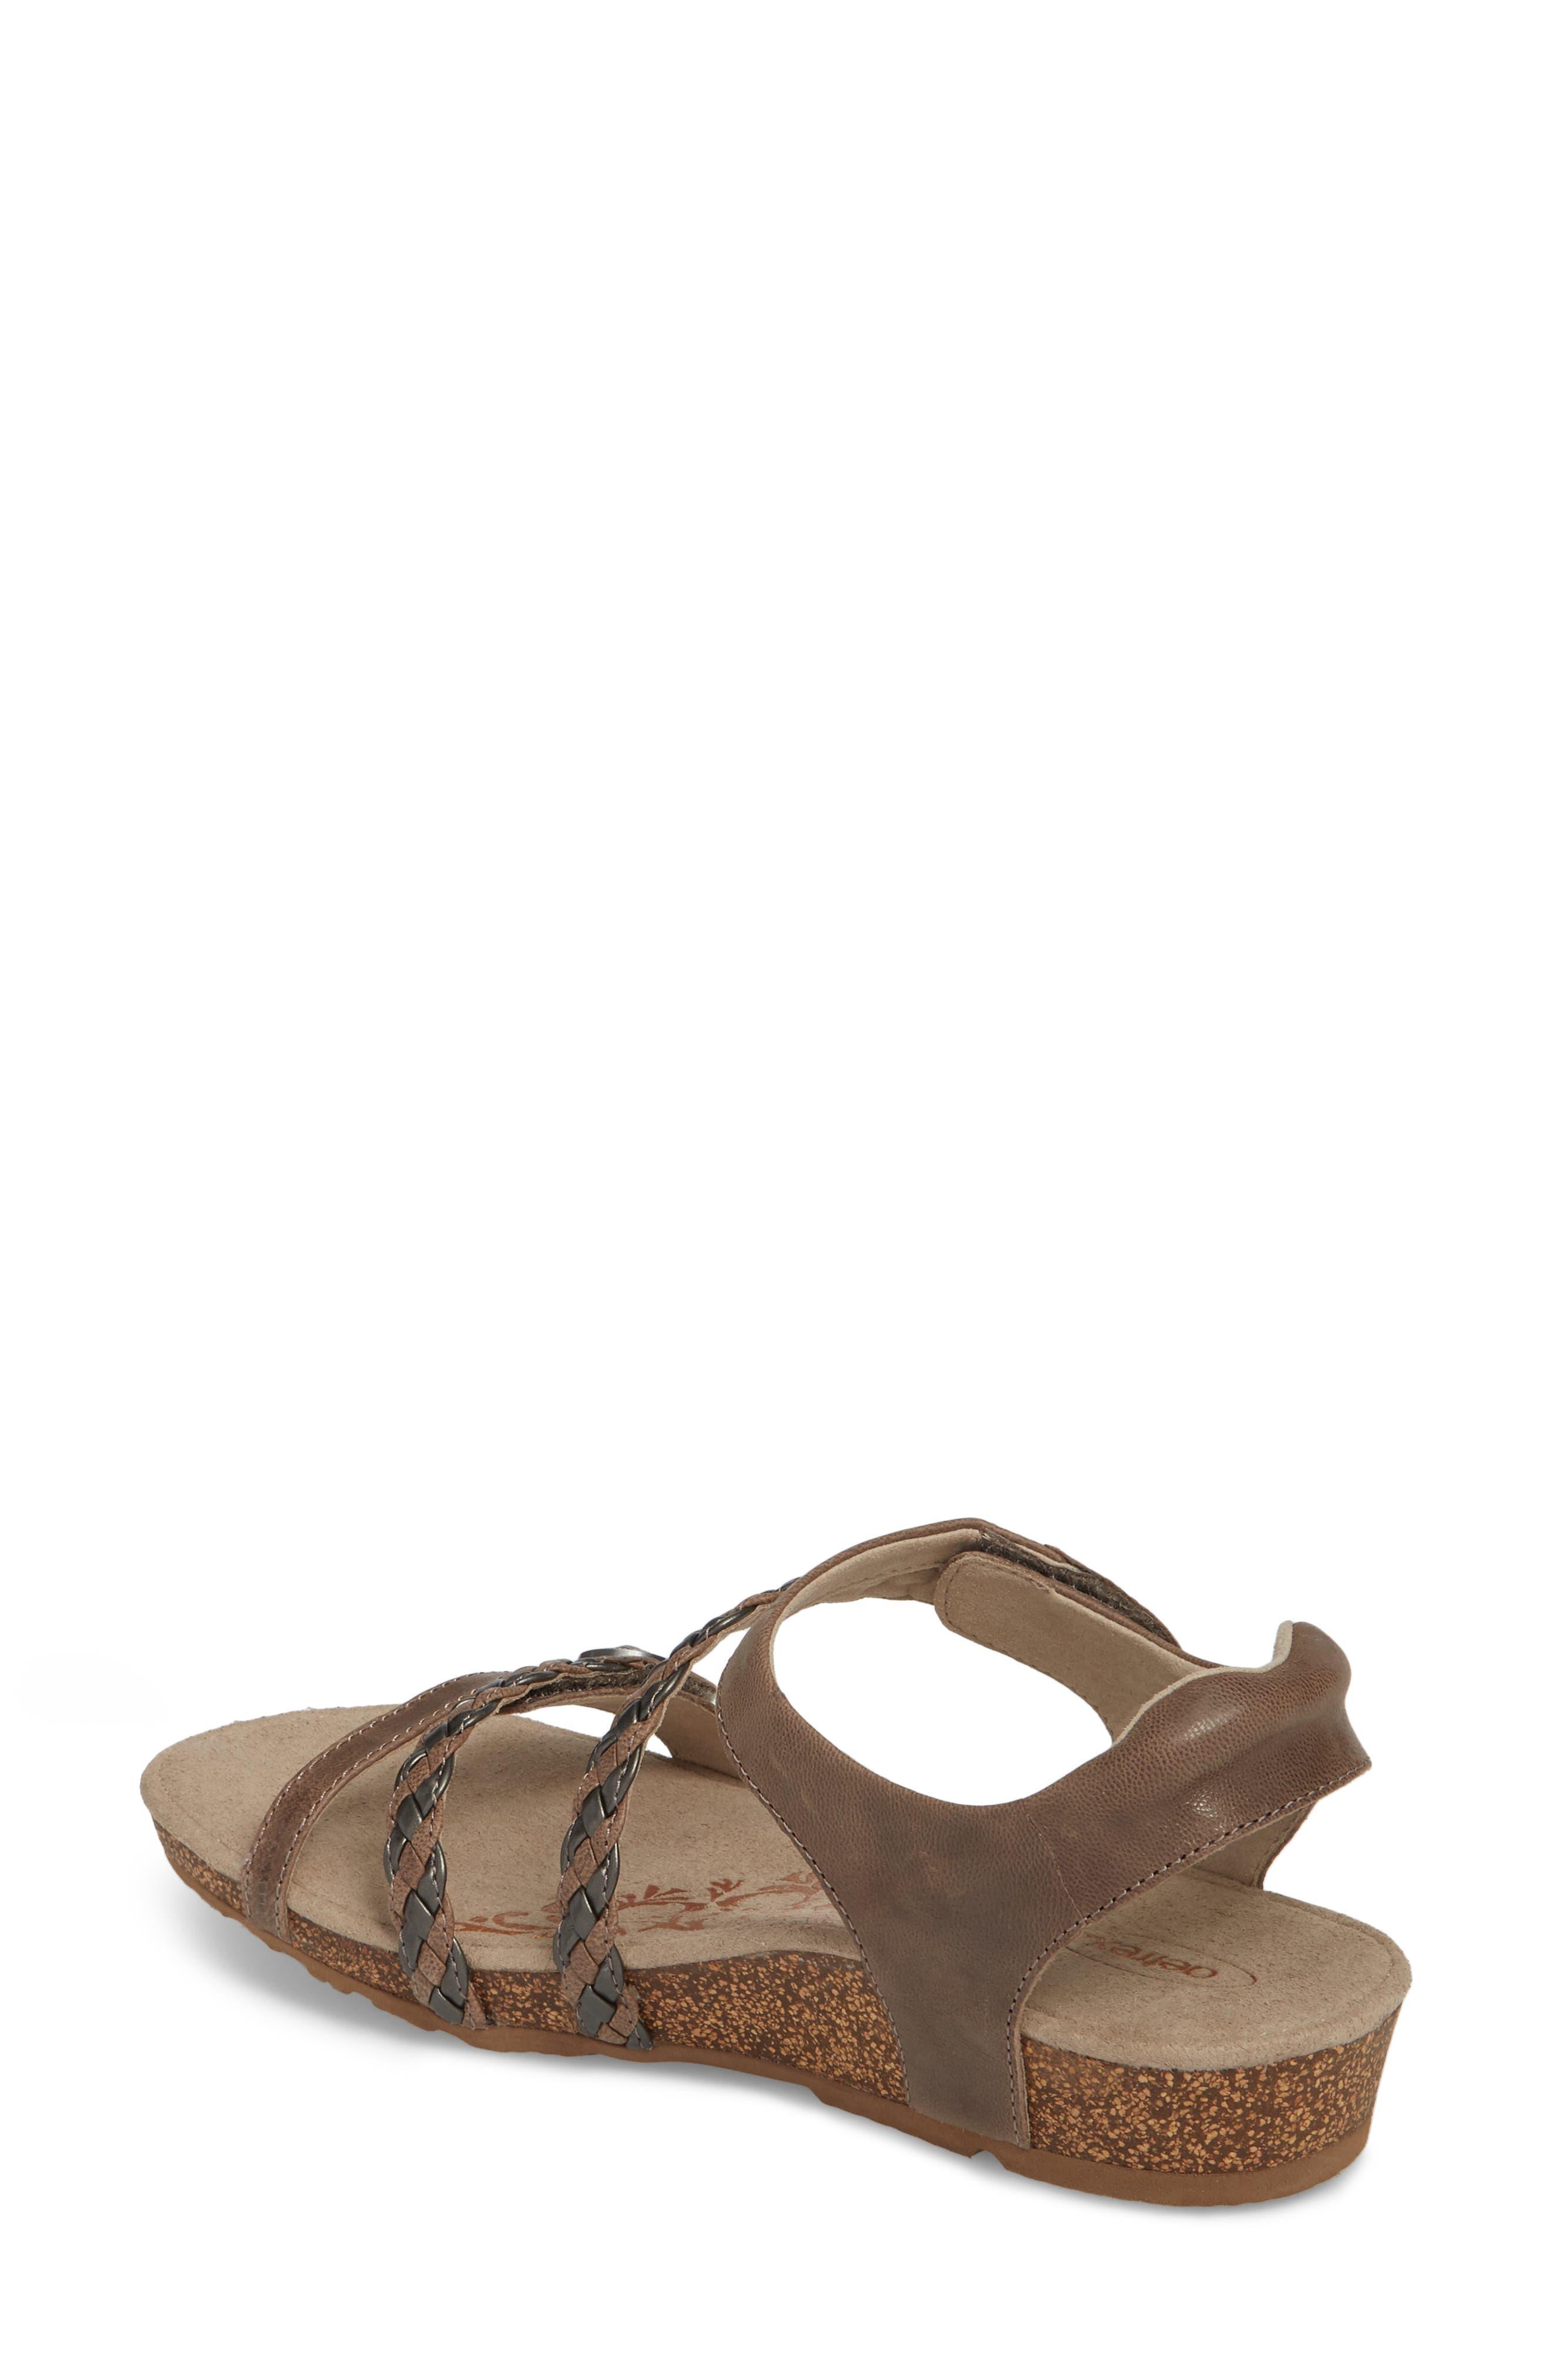 'Jillian' Braided Leather Strap Sandal,                             Alternate thumbnail 2, color,                             GREY LEATHER